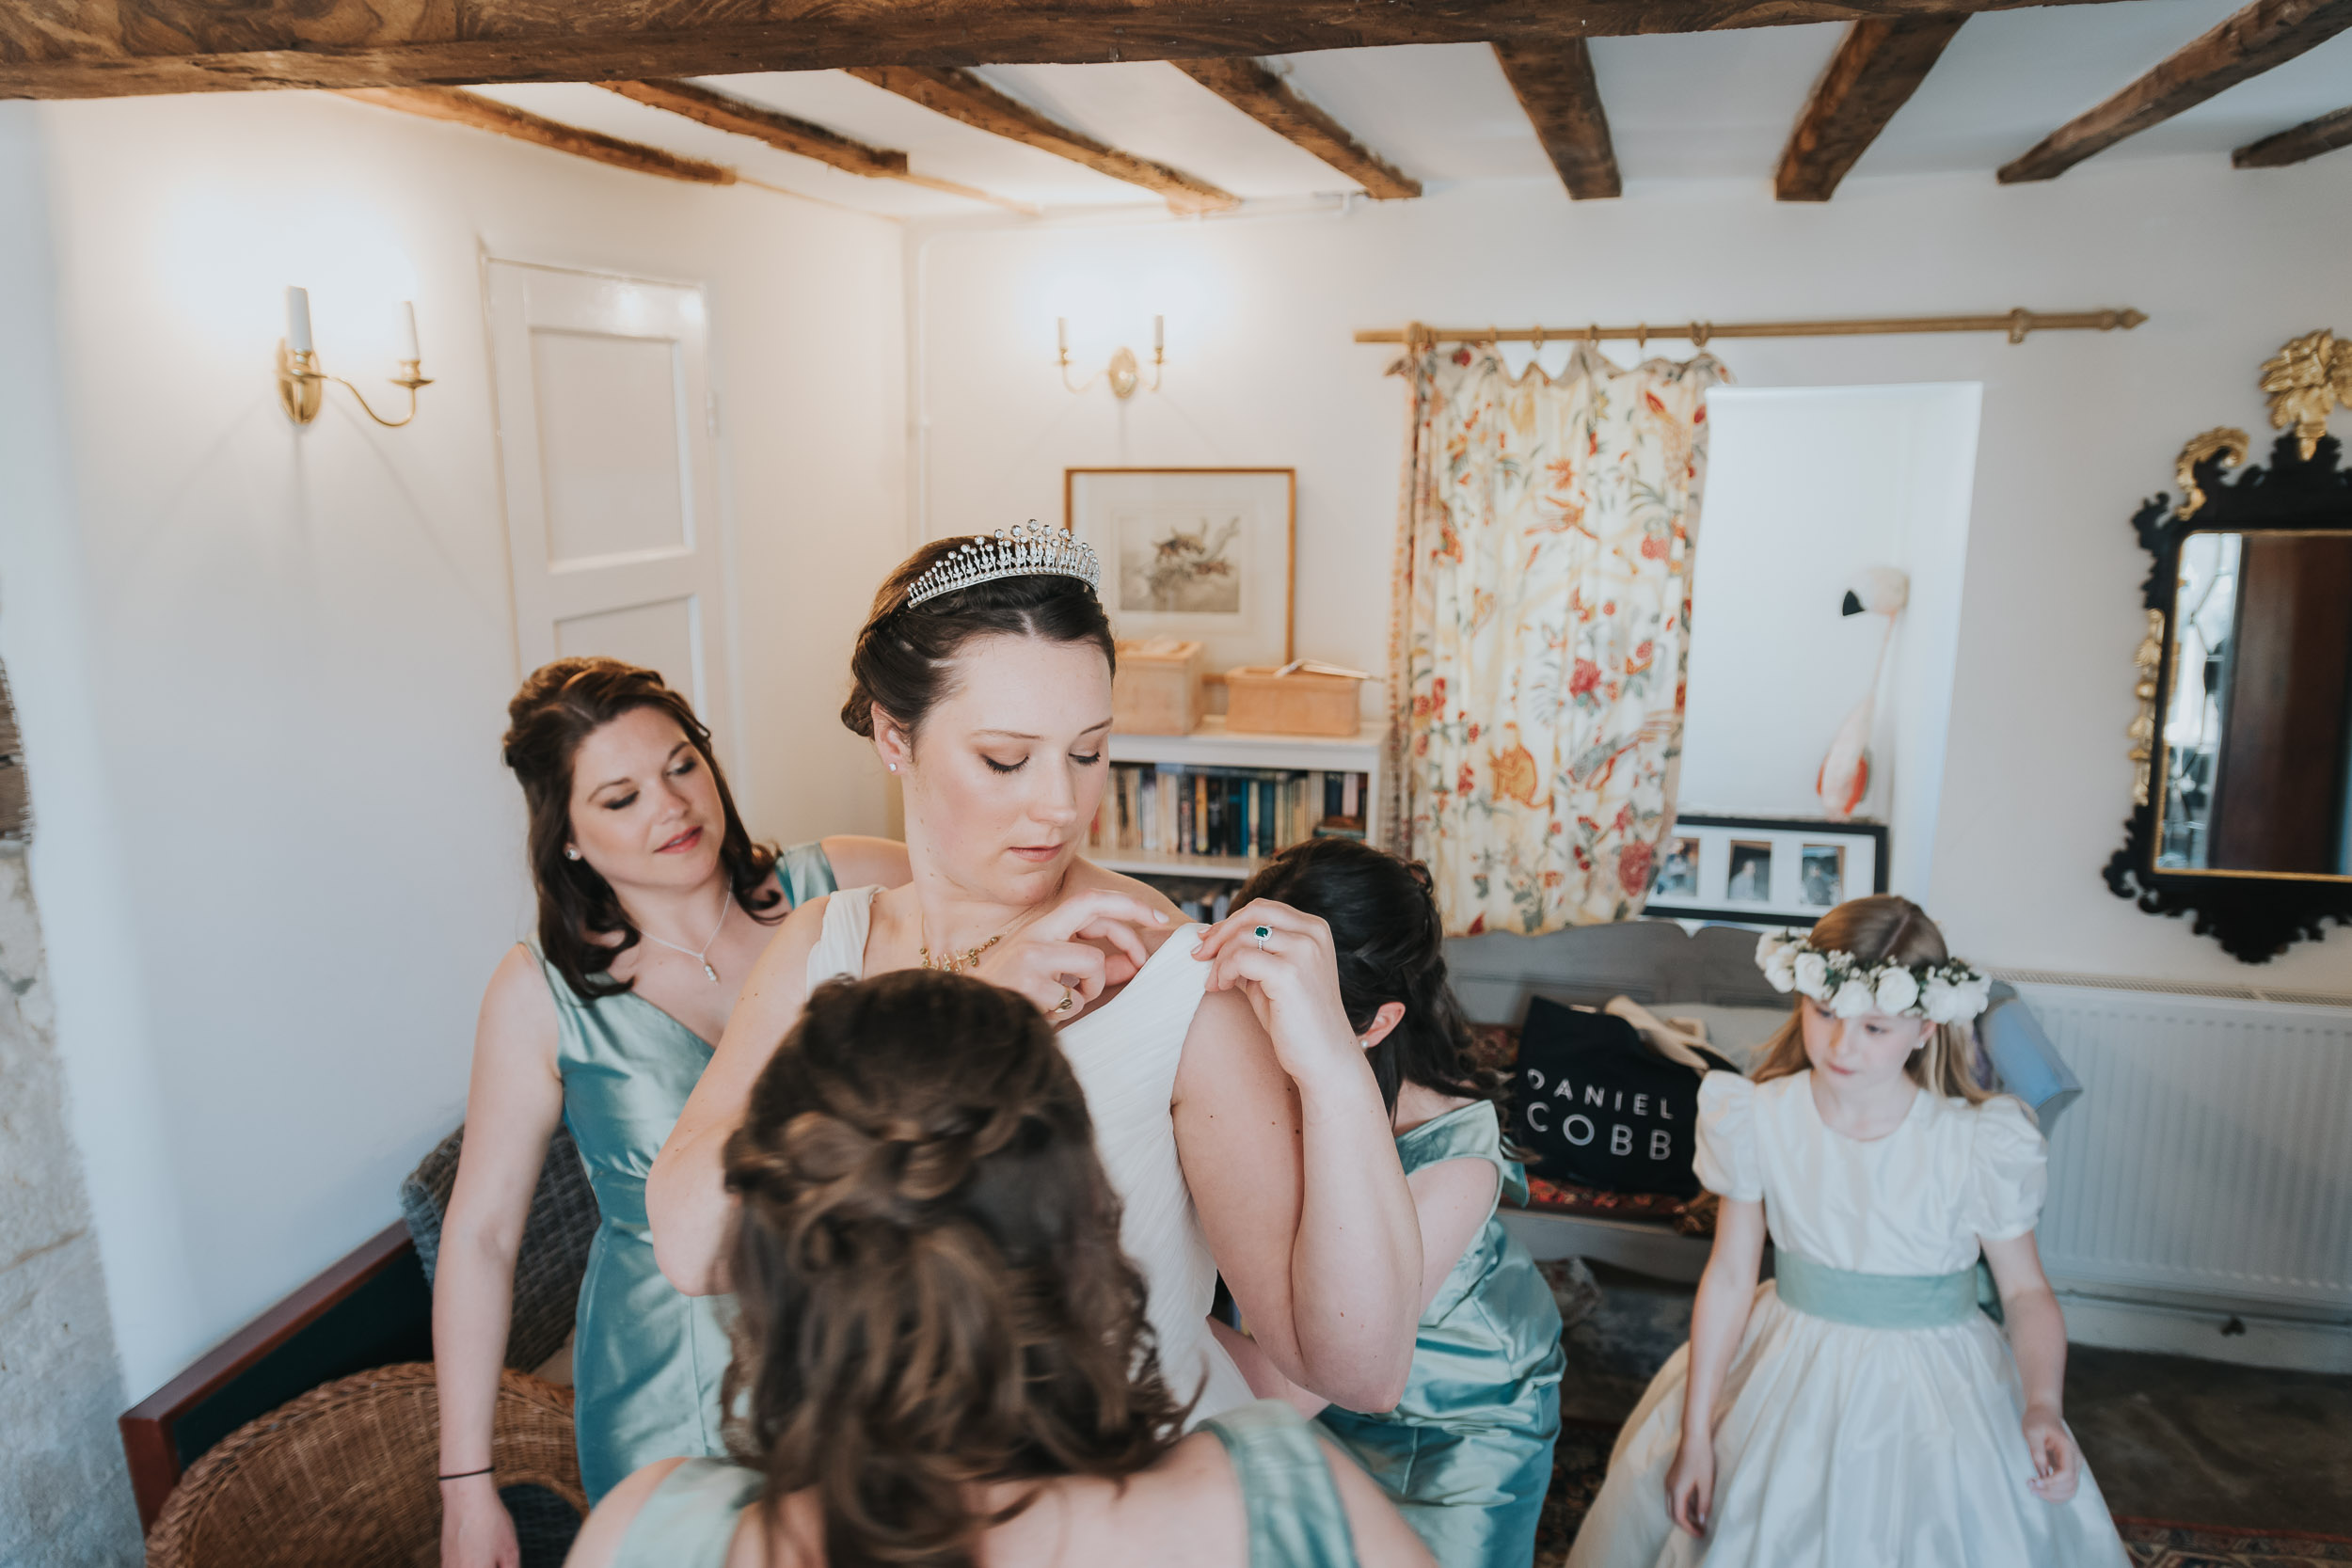 hamswell-house-wedding-w65.jpg